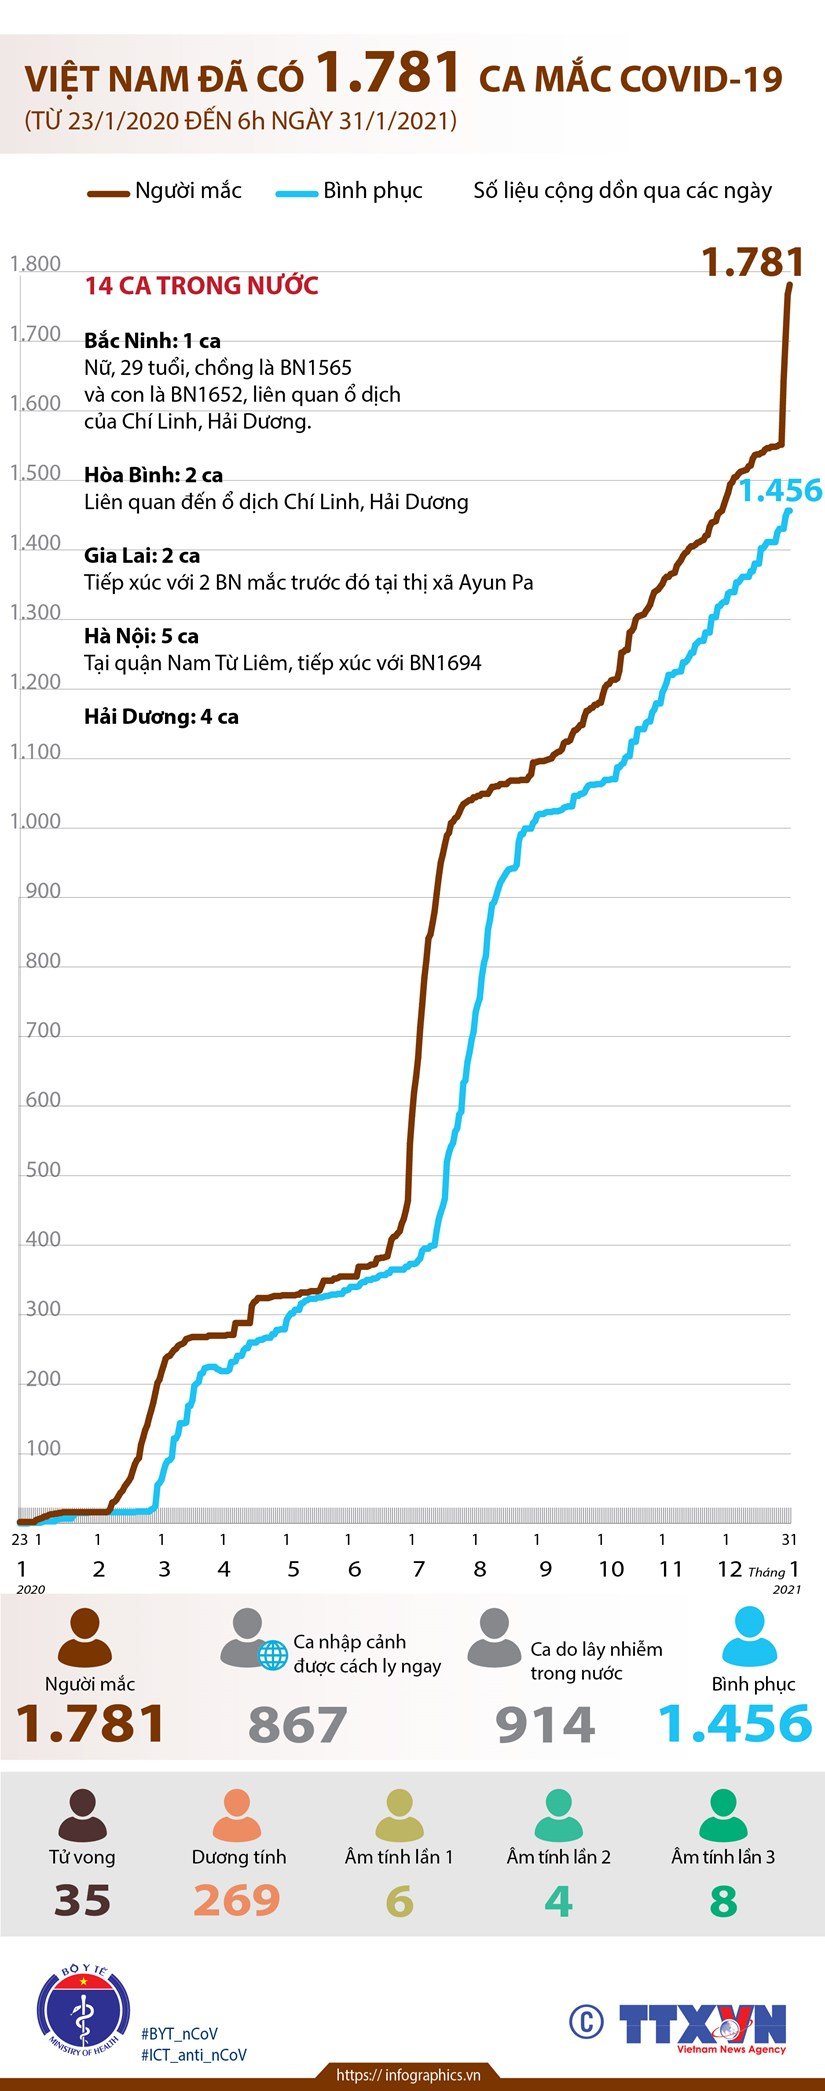 [Infographics] Viet Nam hien da co 1.781 truong hop mac COVID-19 hinh anh 1